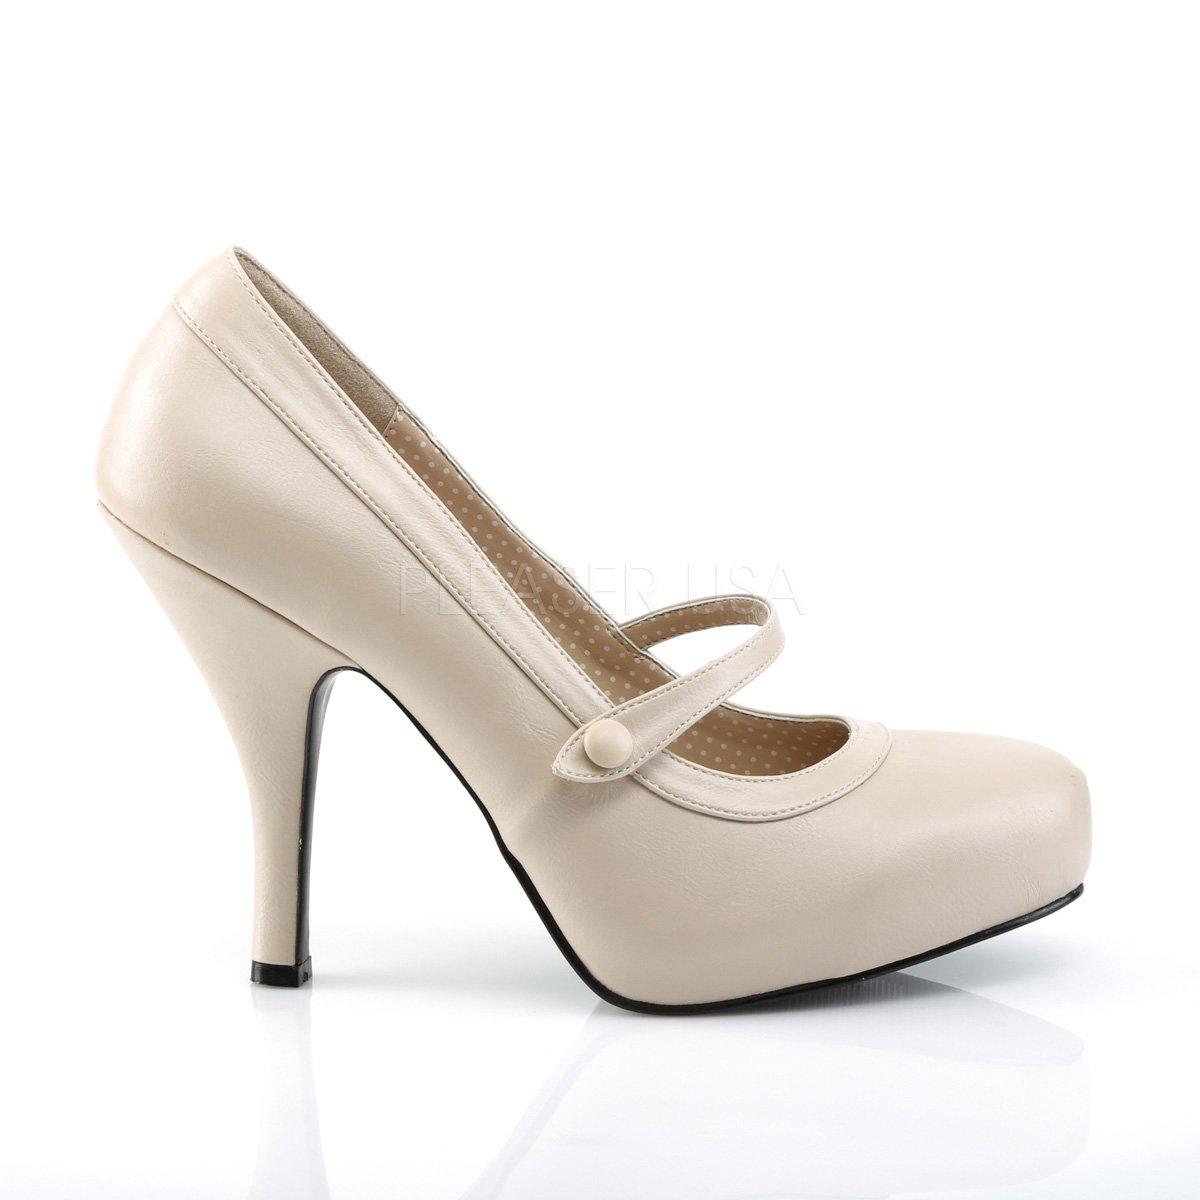 Higher-Heels Rosa Label Gr. Damen Mary Janes Pinup-01 Creme matt Gr. Label 45 4f610e